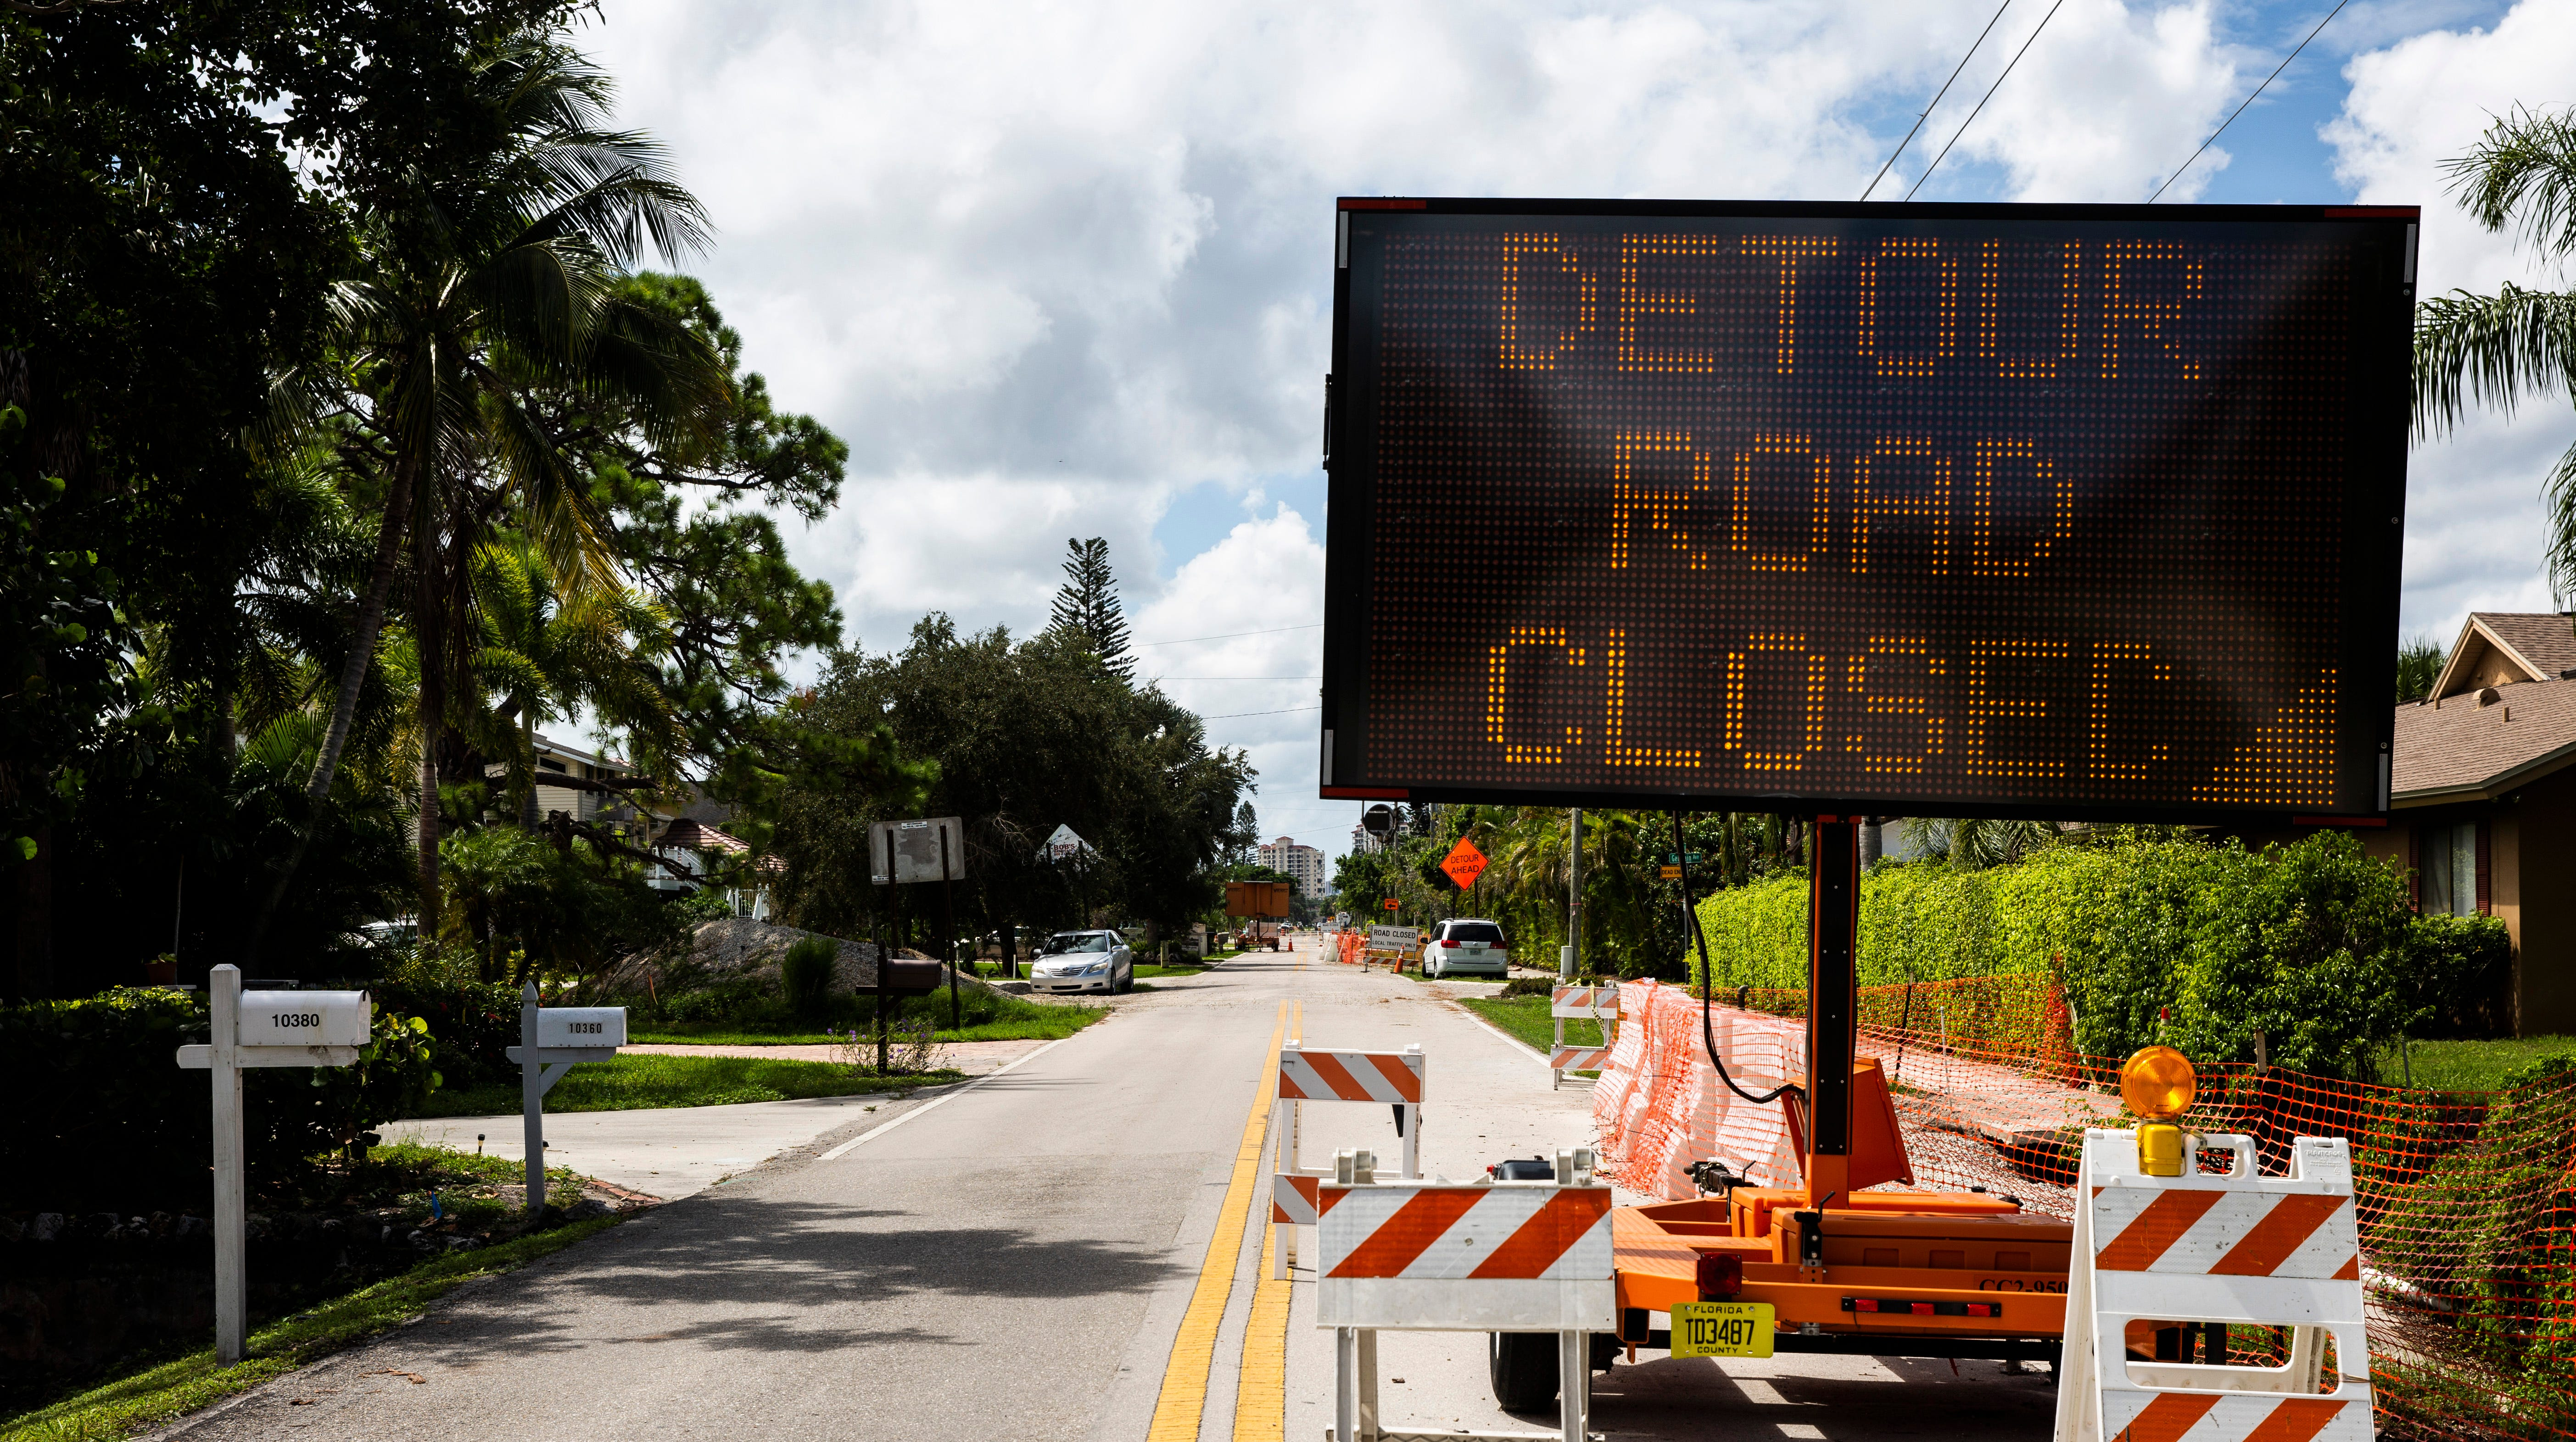 Vanderbilt Drive utilities work in North Naples delayed further until September 2019